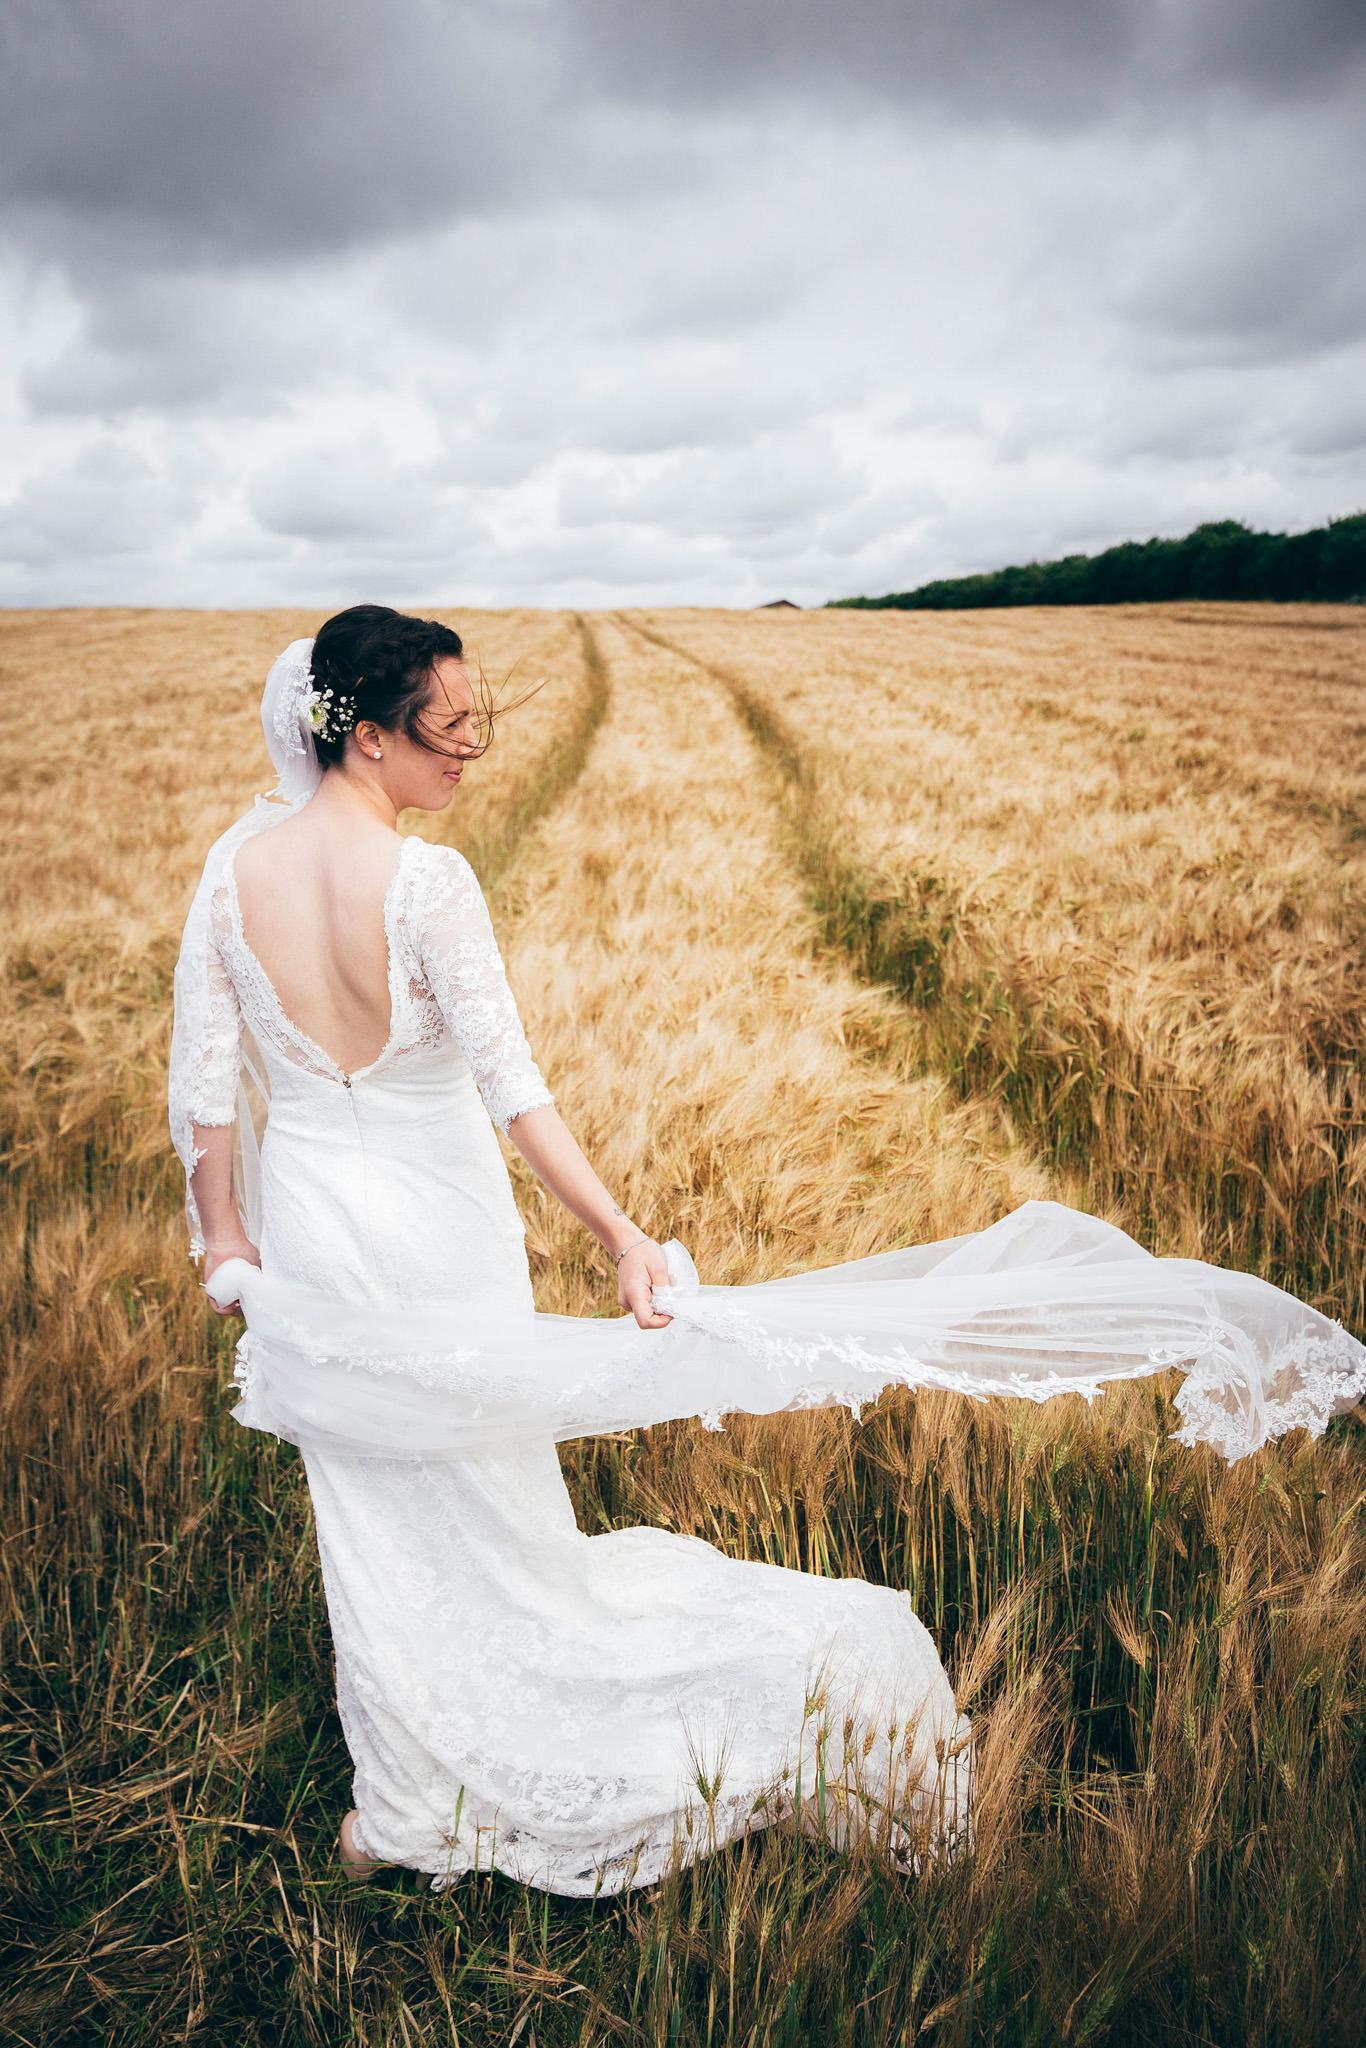 Norway+wedding+photographer+elopement+pre+wedding+Casey+Arneson-80.jpg